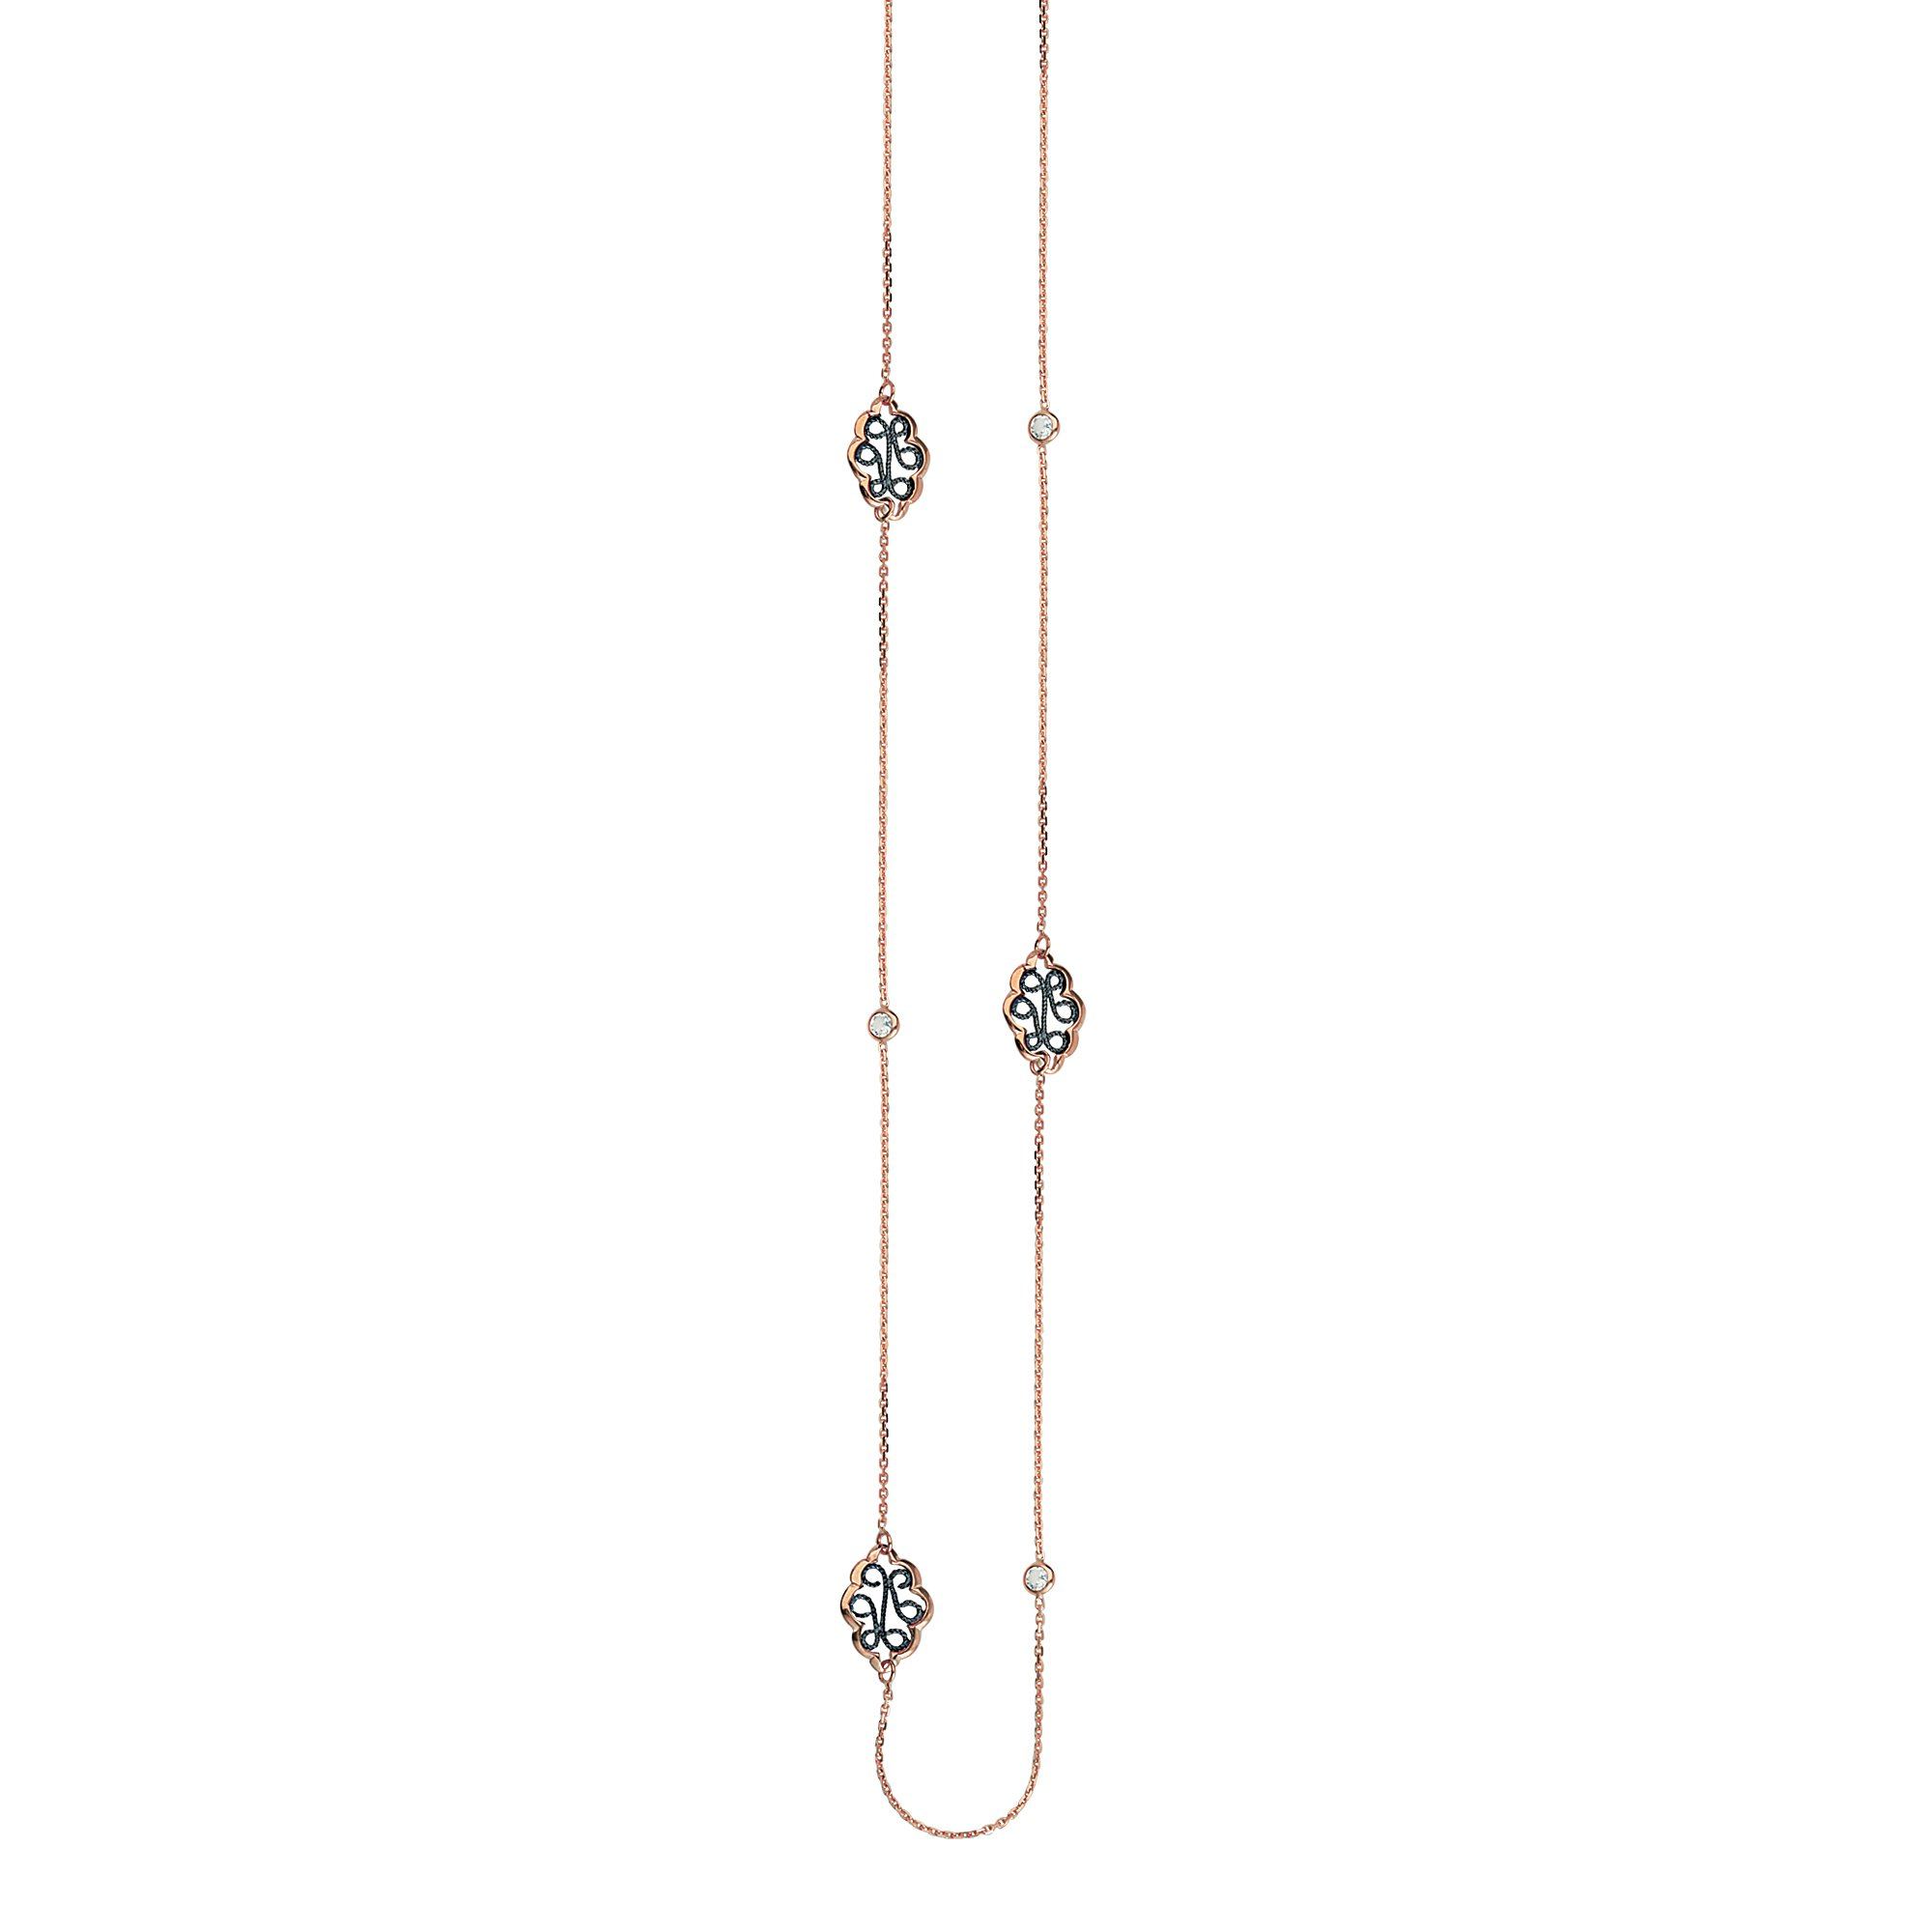 DiamondJewelryNY Silver Pendant Ss Longlngth Cz Blck Rhod Neck 36